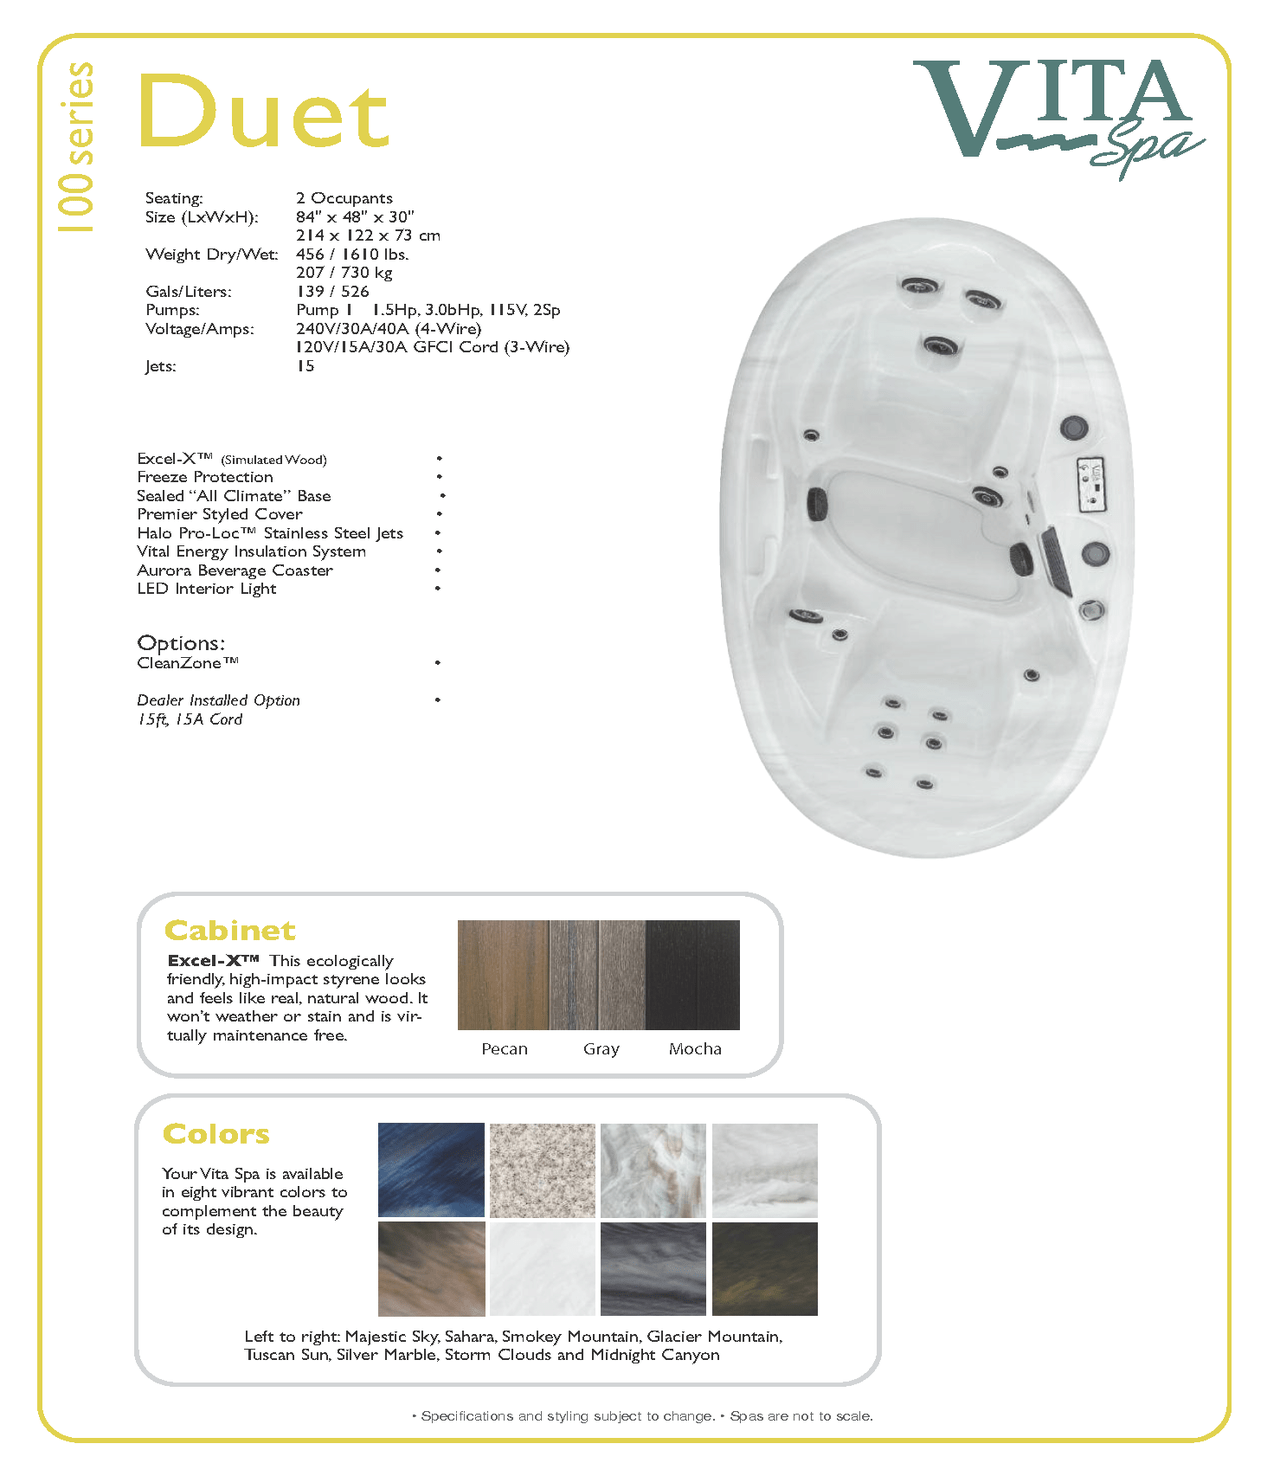 Vita Spas Duet Hot Tub